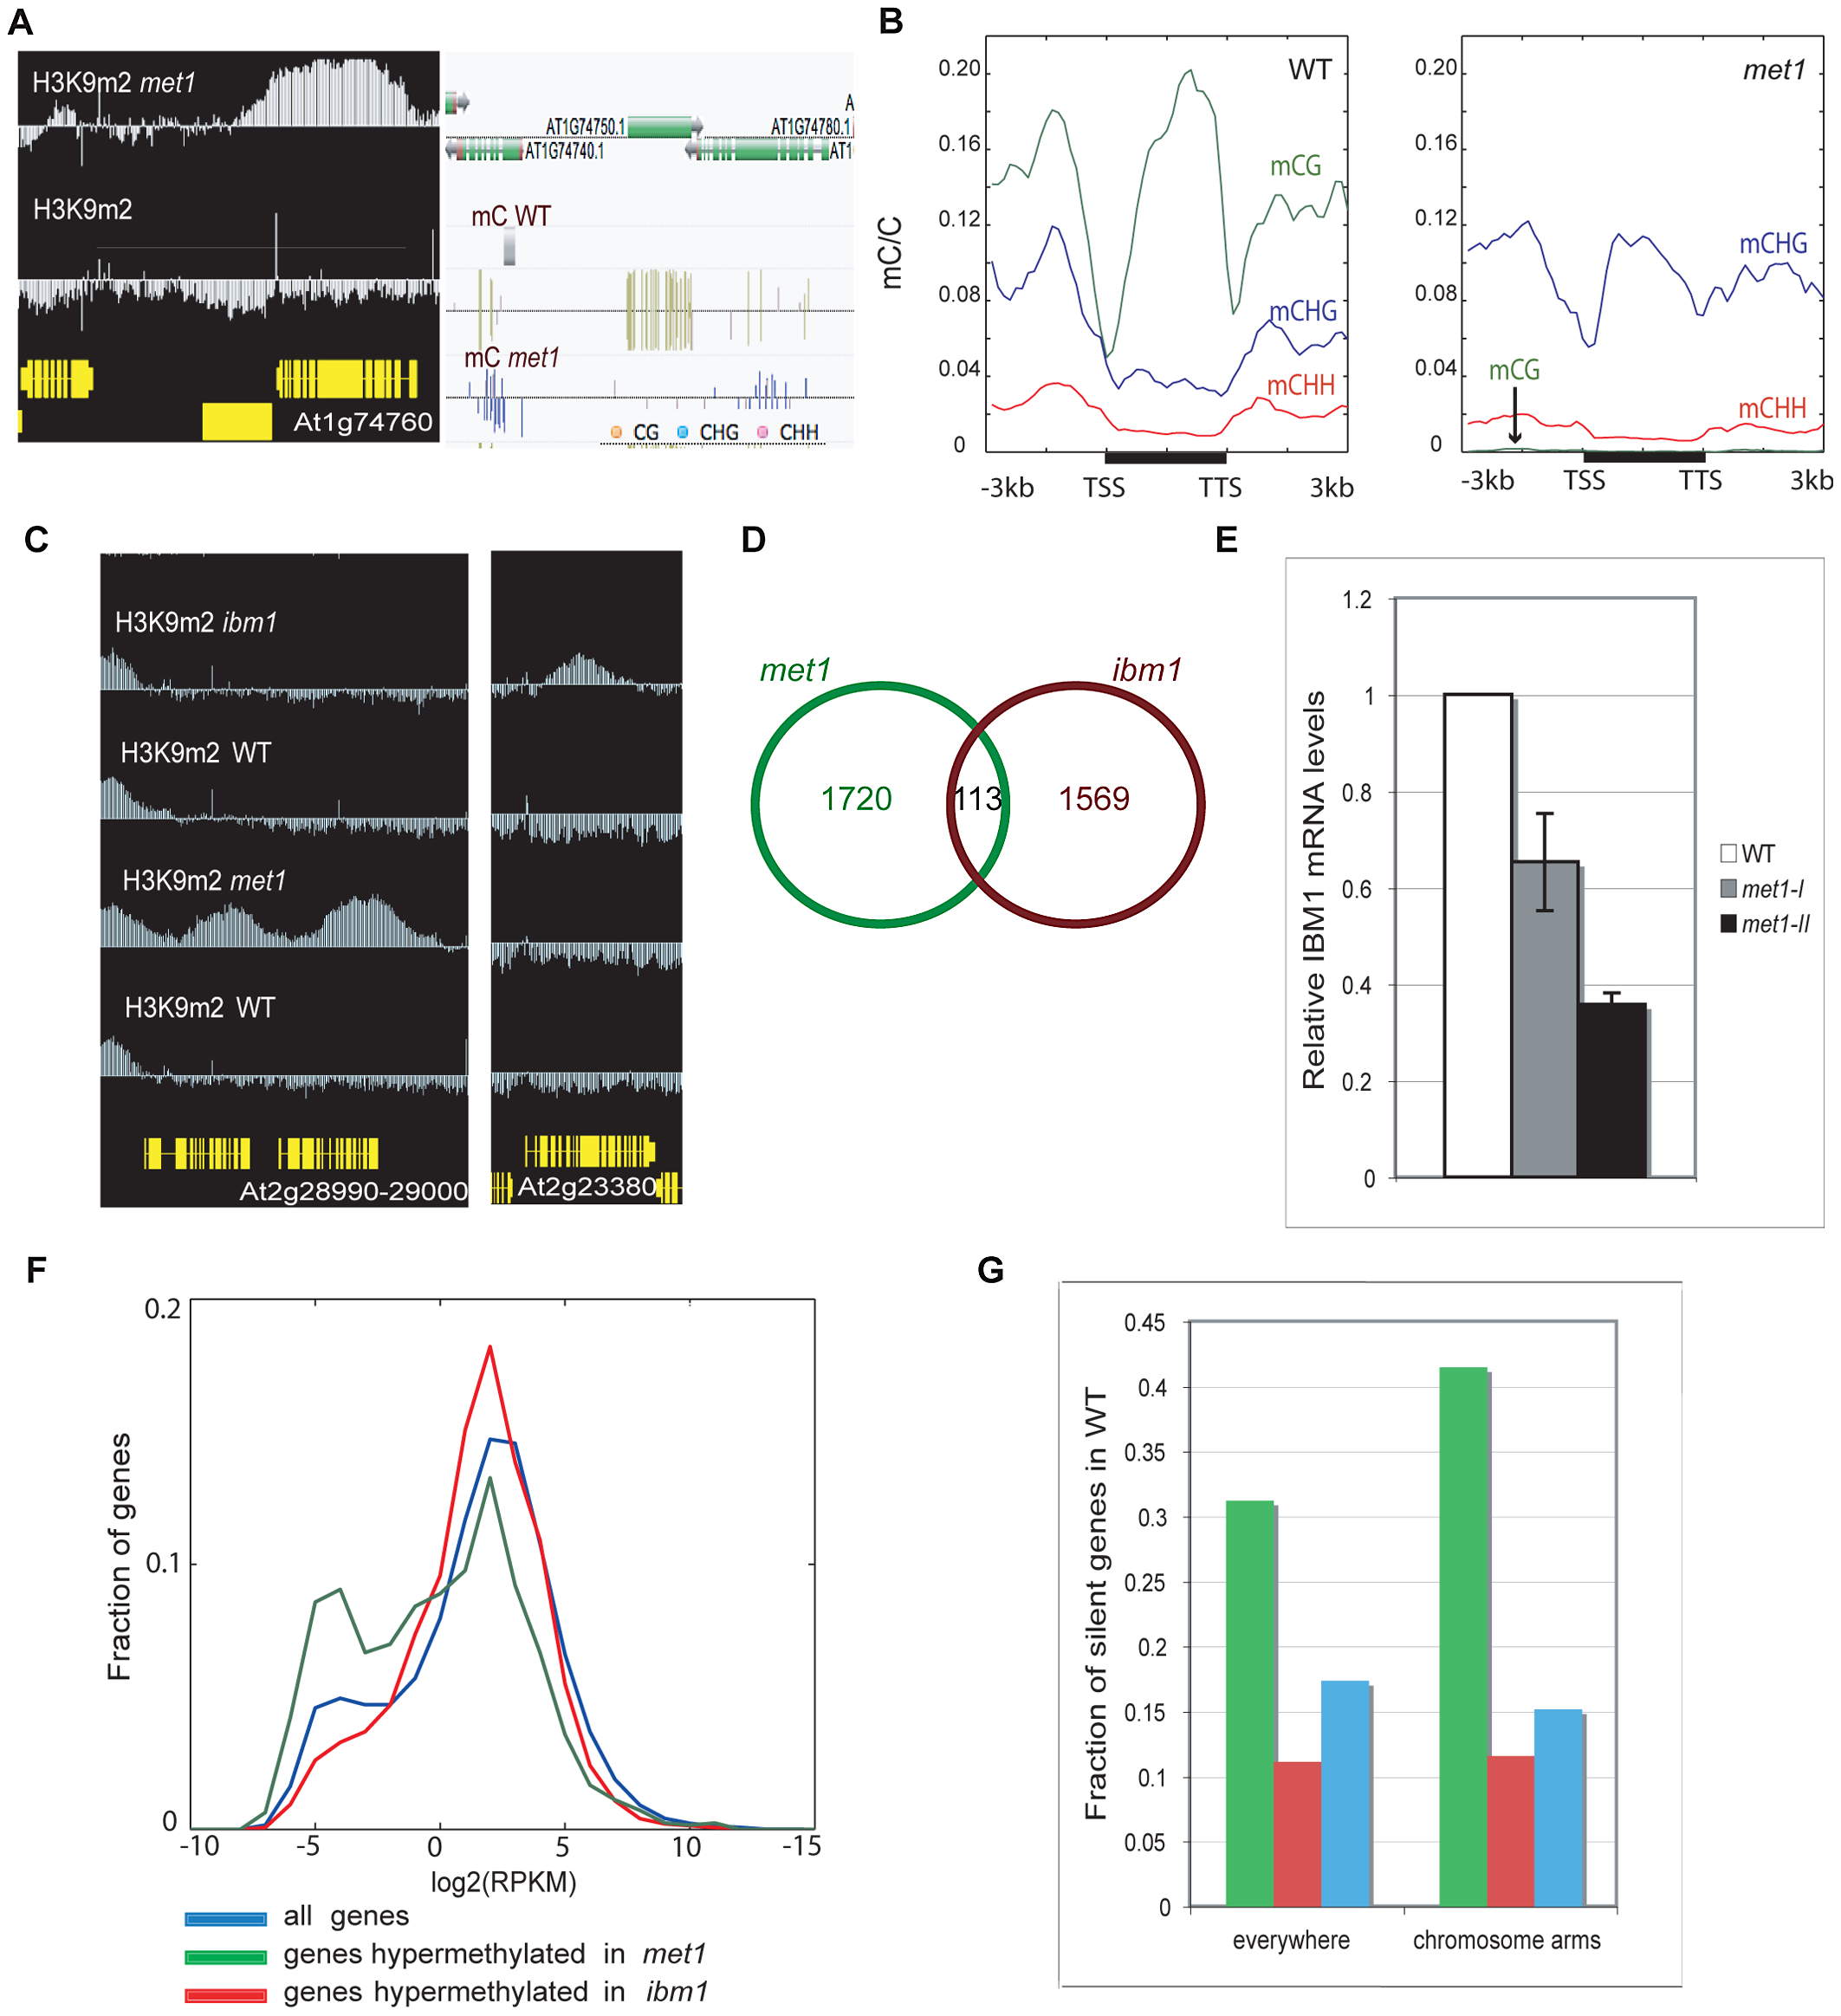 Genome-wide comparison of H3K9 hypermethylated genes in <i>met1</i> and <i>ibm1</i> mutants.